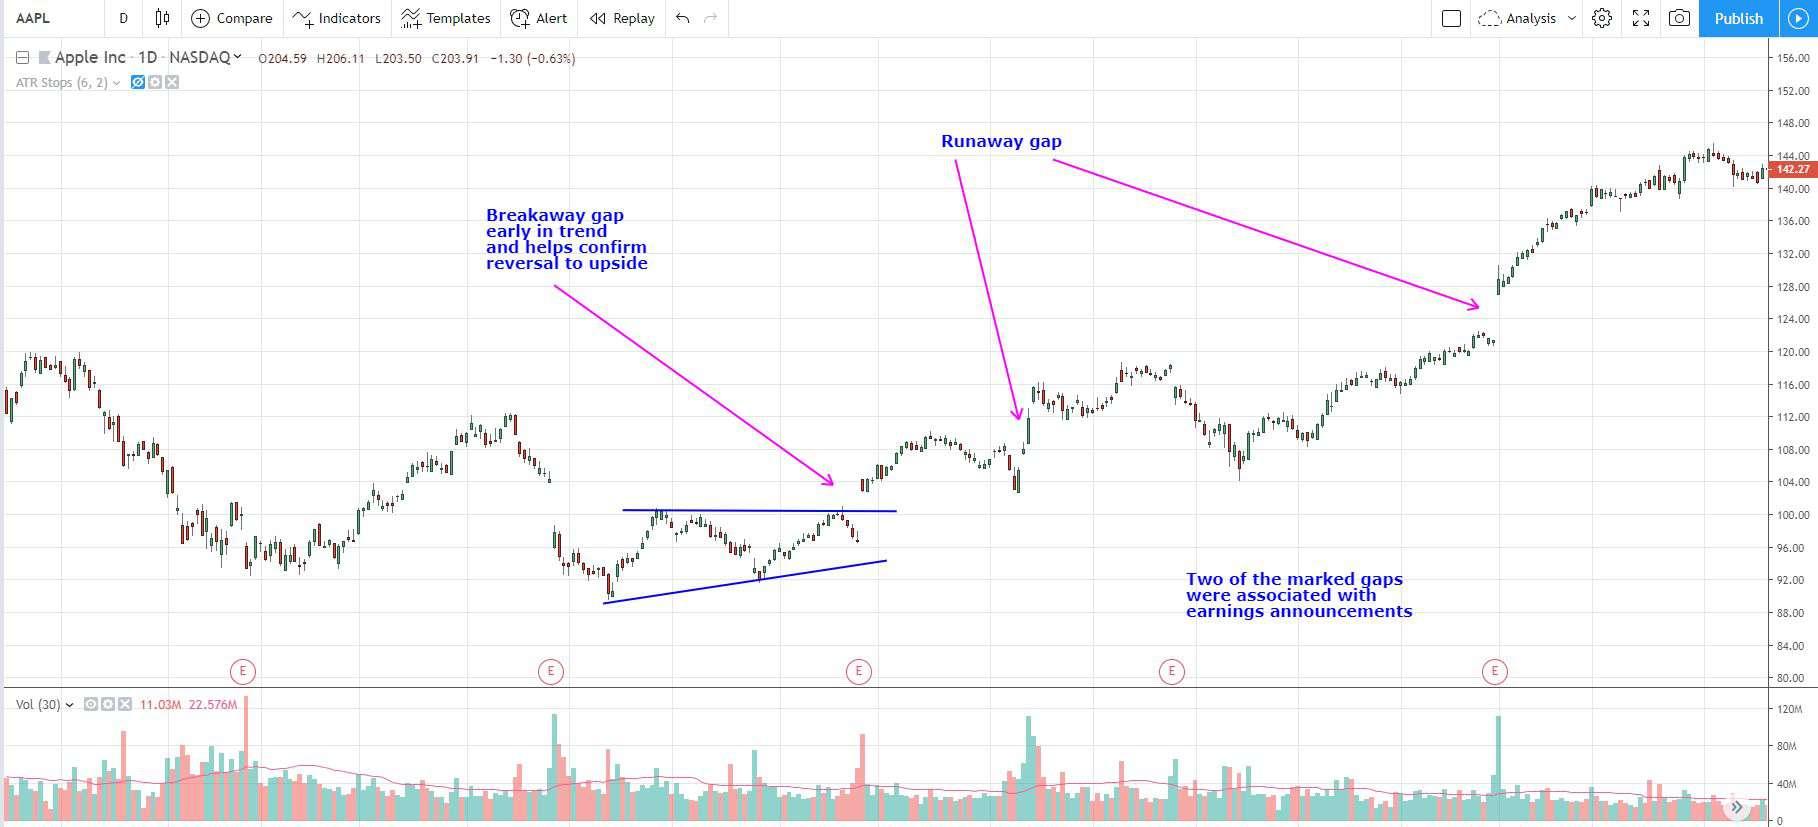 Breakaway gap chart example in APPL with runaway gaps